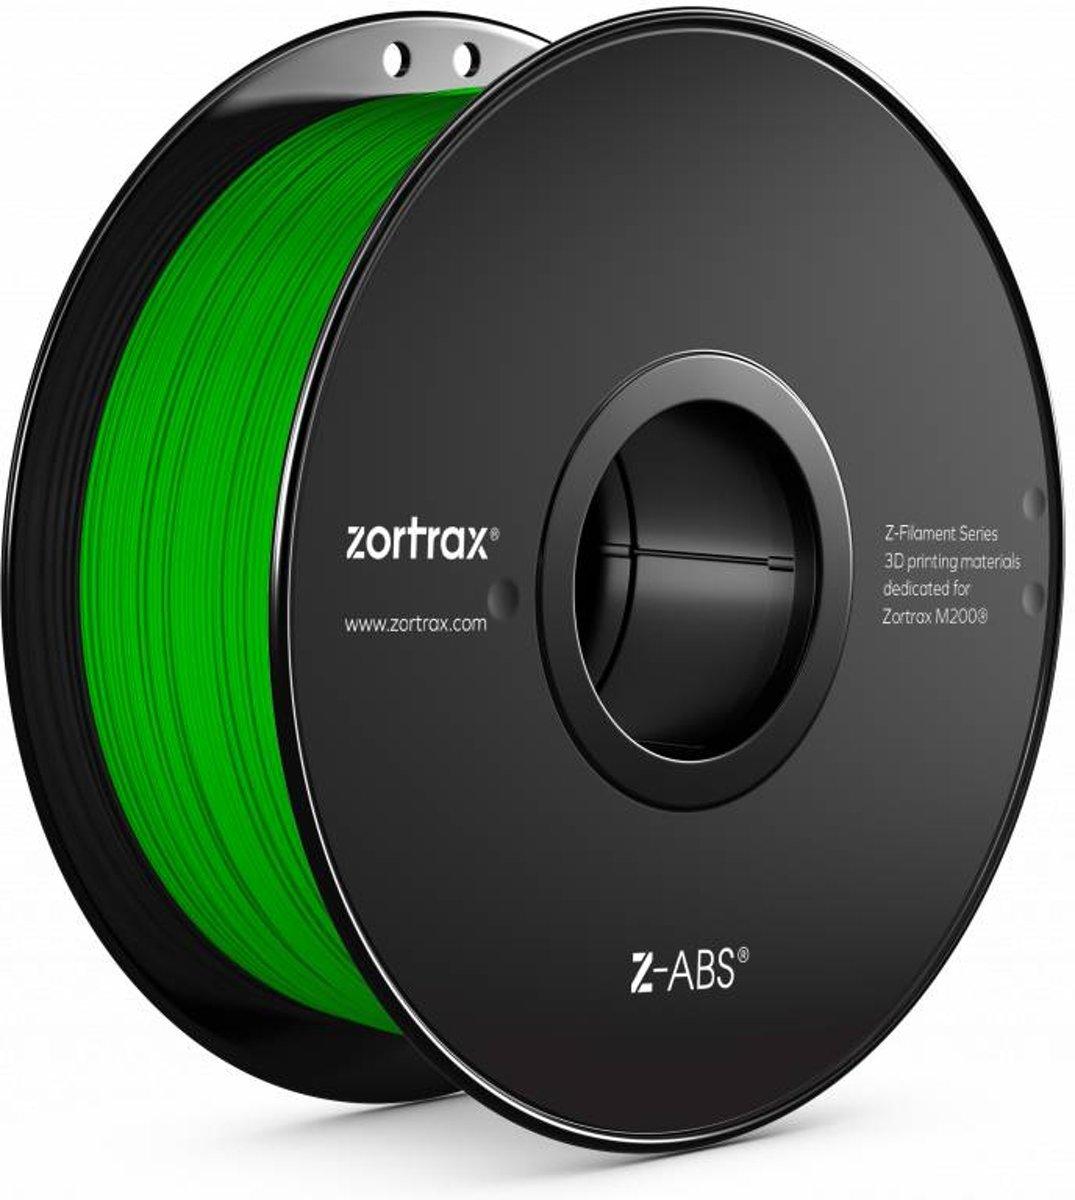 Zortrax Z-Hips Green